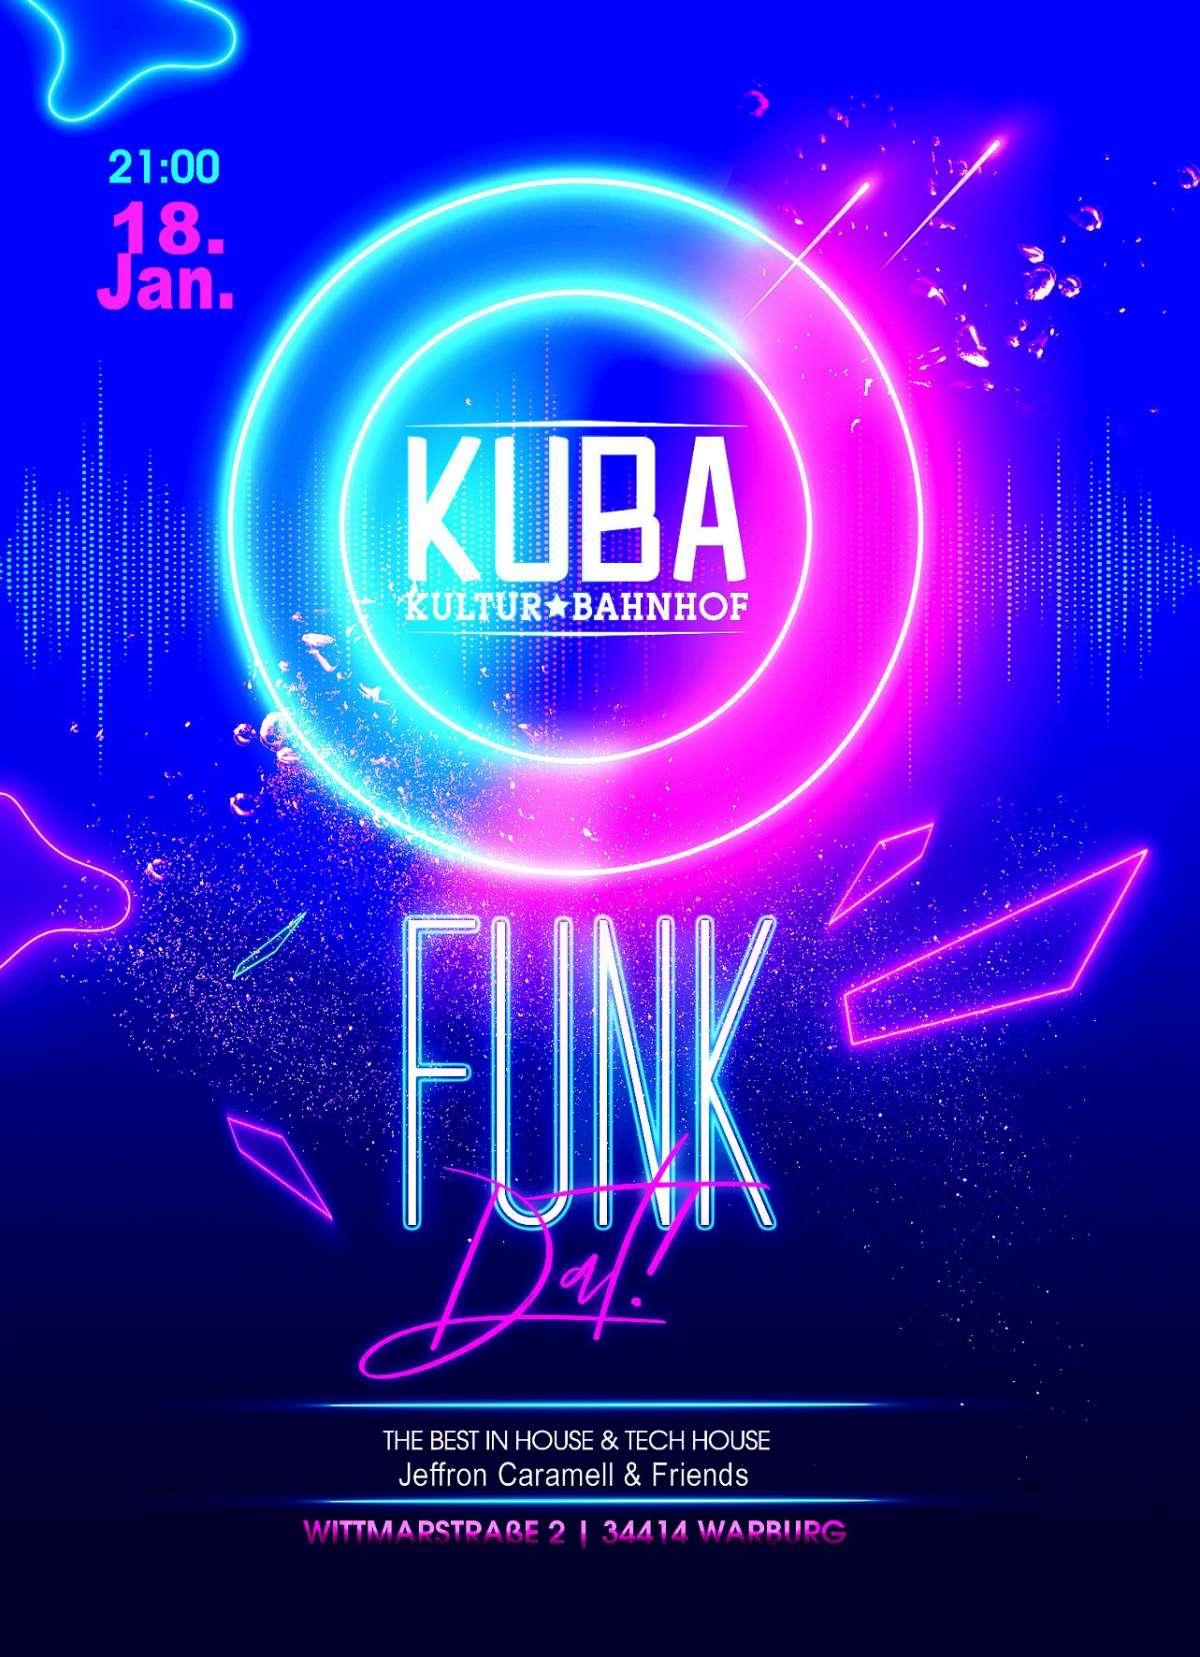 Veranstaltungen & Events am »Samstag, 18. Januar 2020« in deiner Nähe...